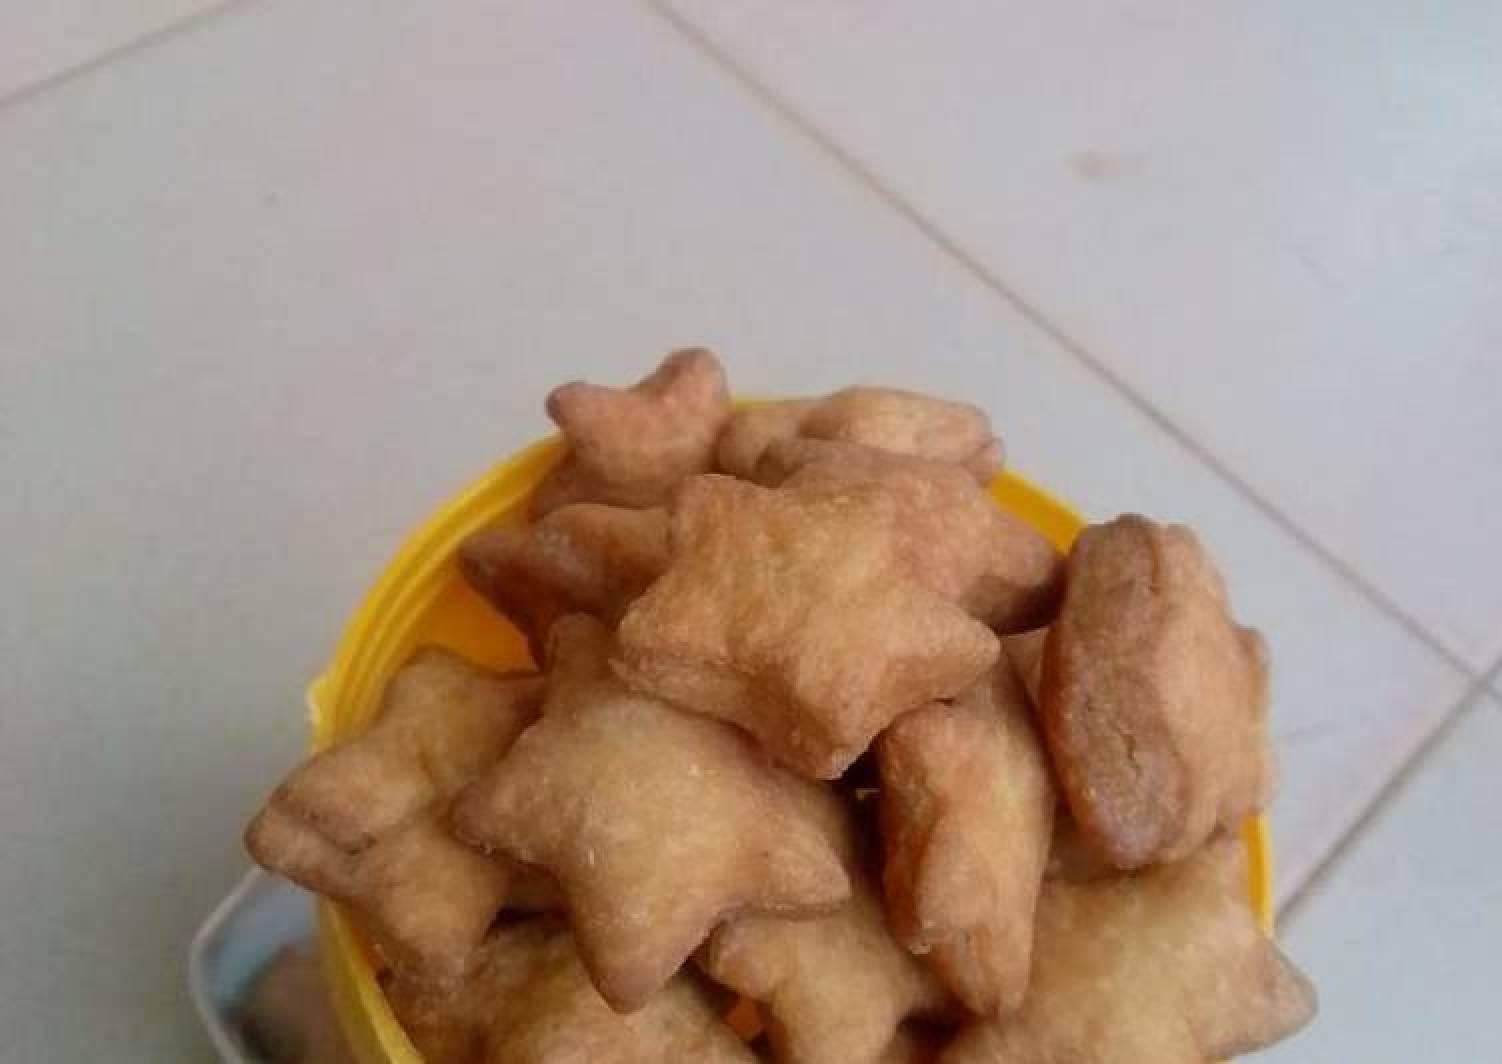 Baked star chinchin